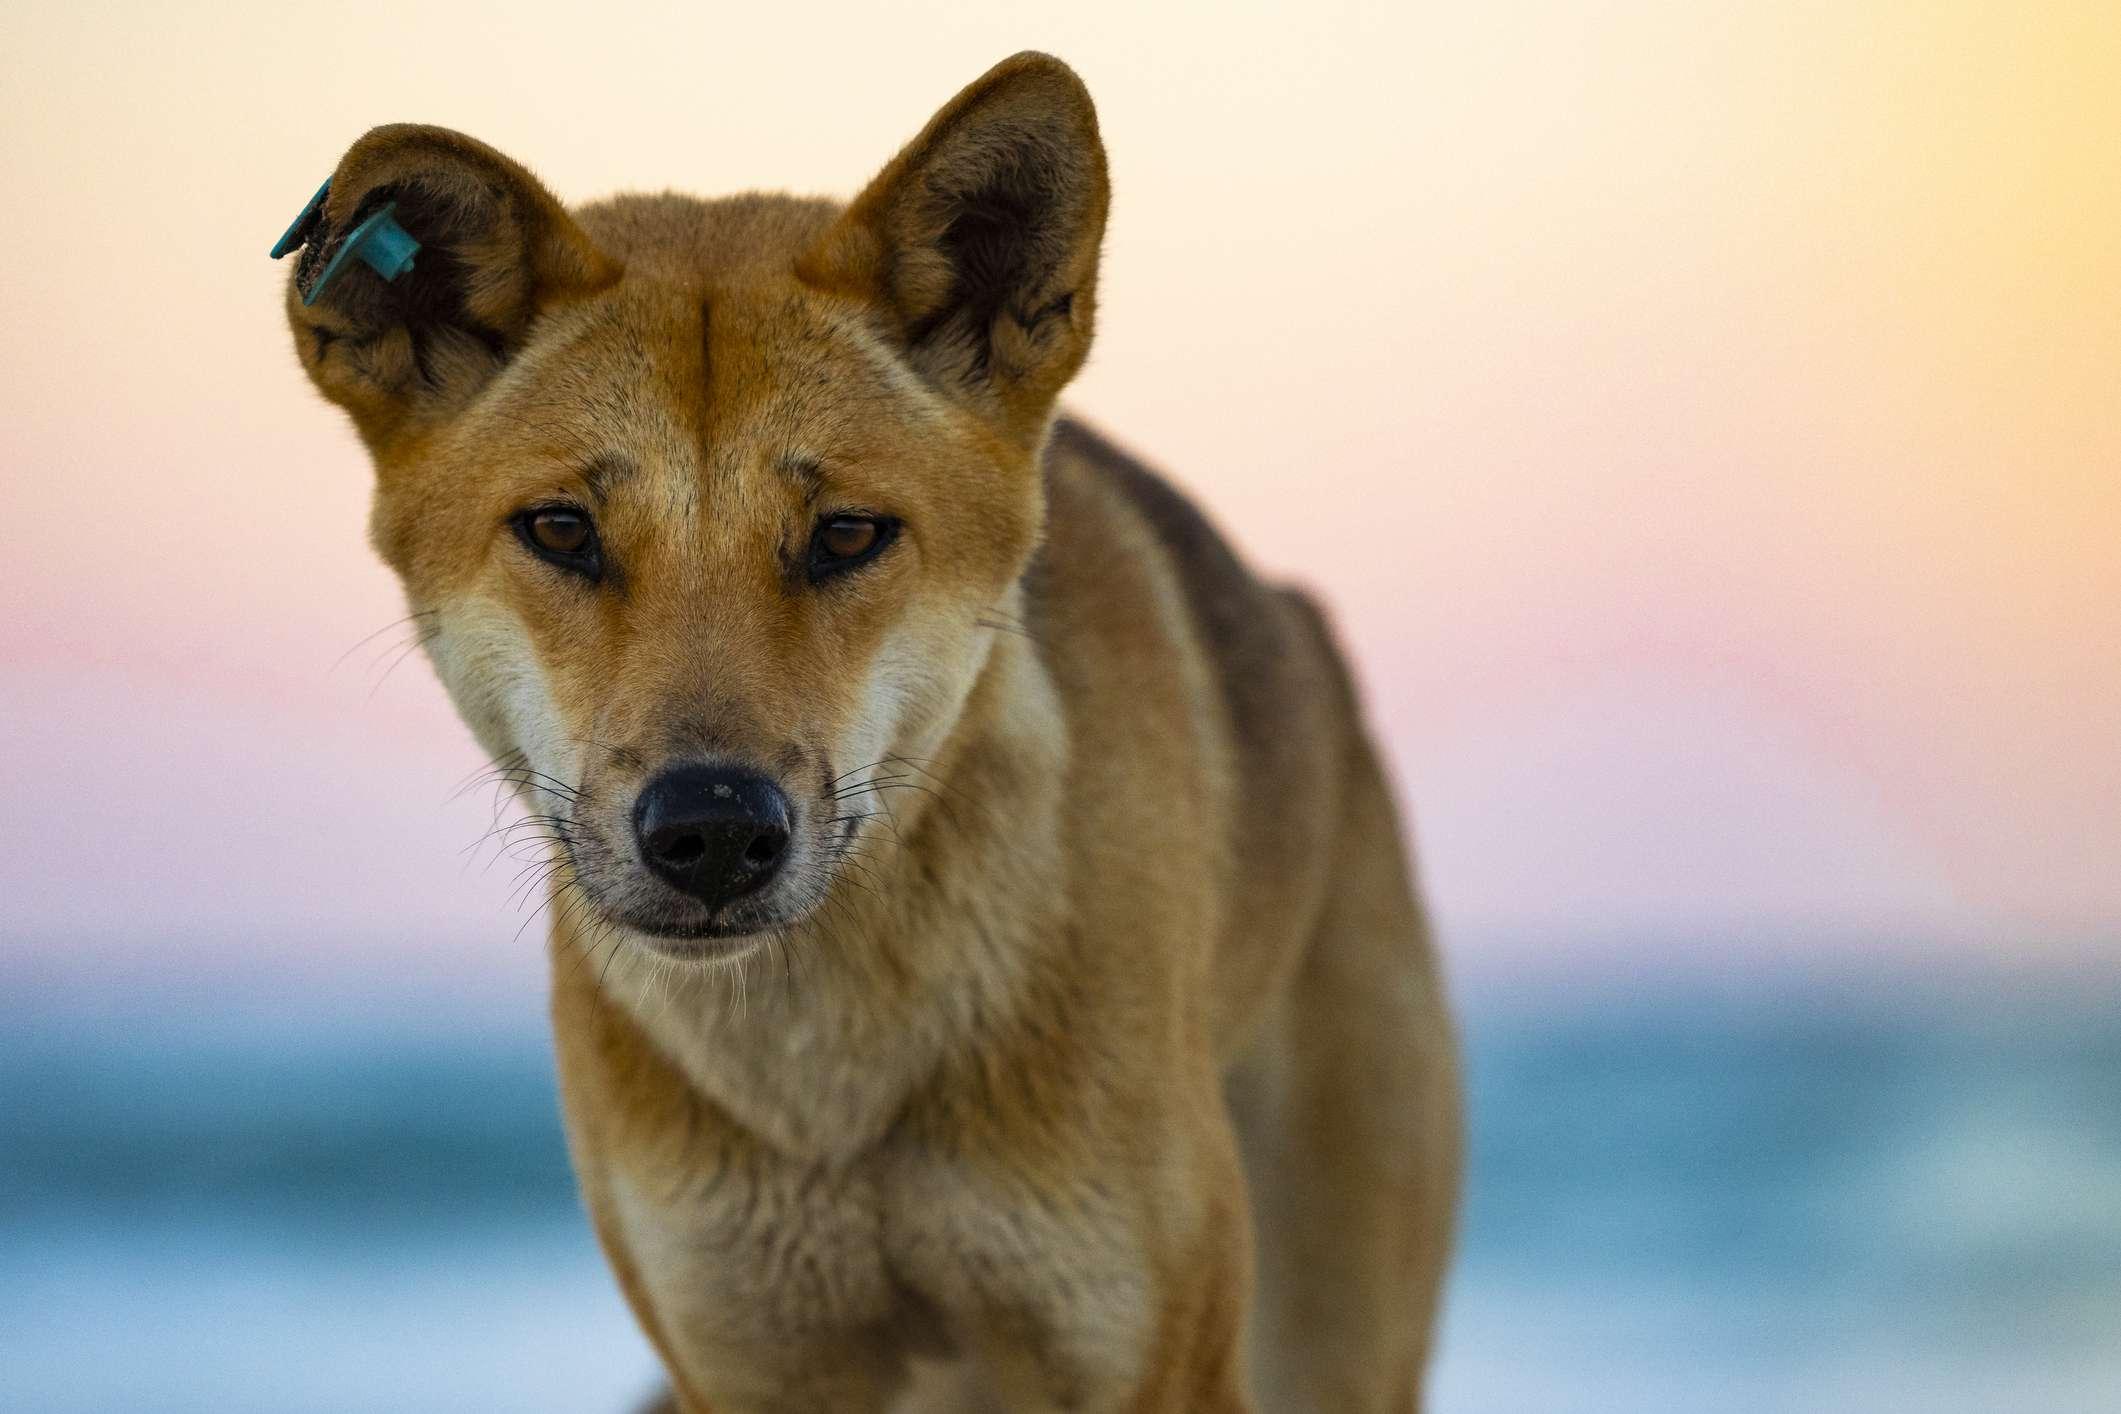 Australian dingo profile in front of sunset